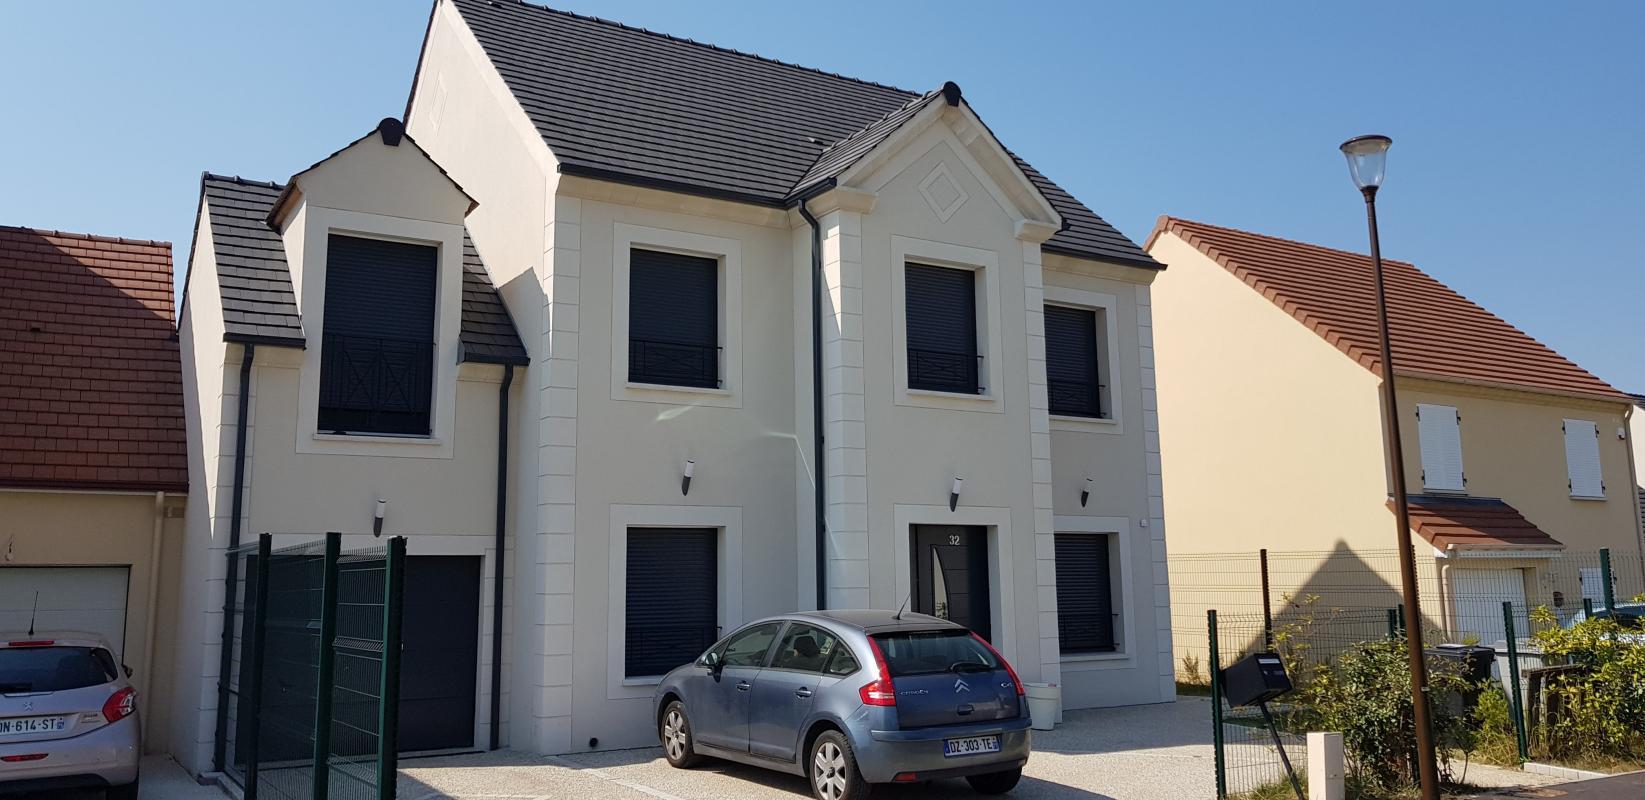 Terrains du constructeur LDP • 500 m² • GRANDFRESNOY